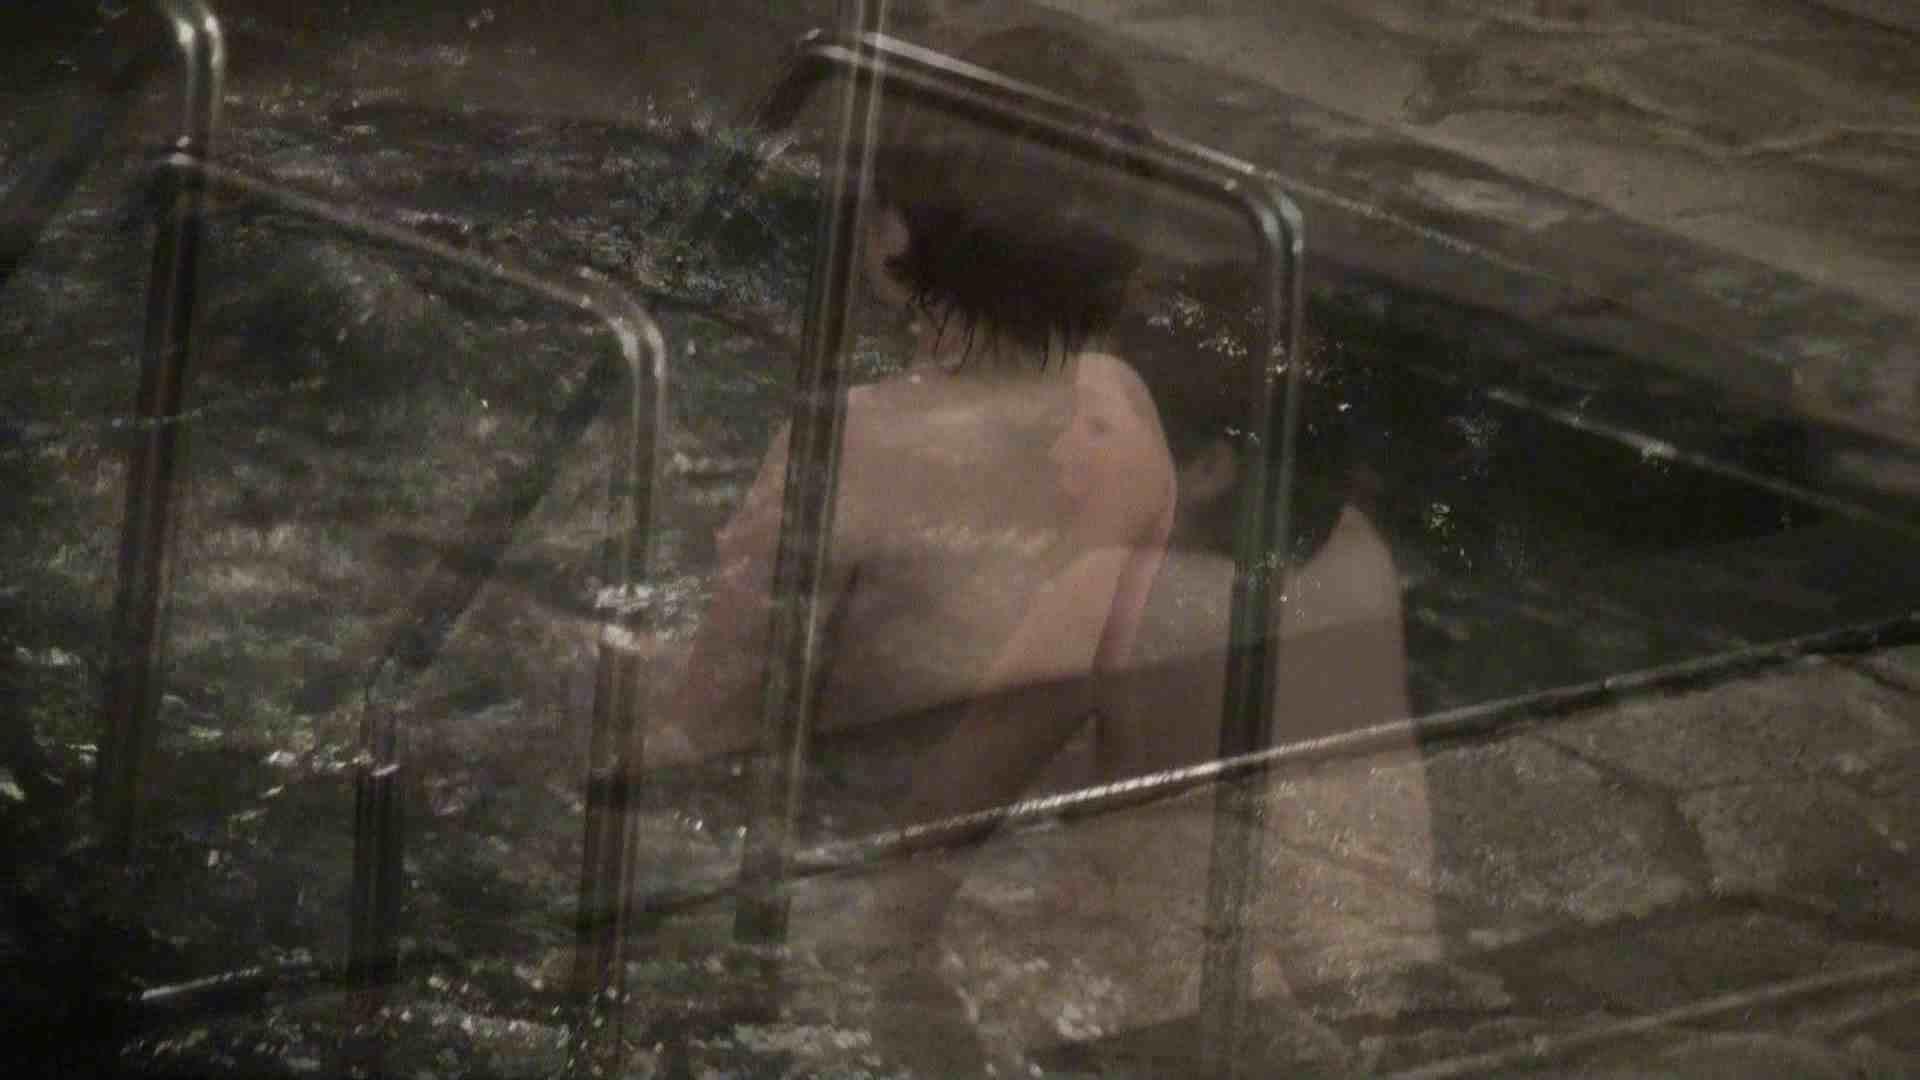 Aquaな露天風呂Vol.432 露天 アダルト動画キャプチャ 86PICs 44